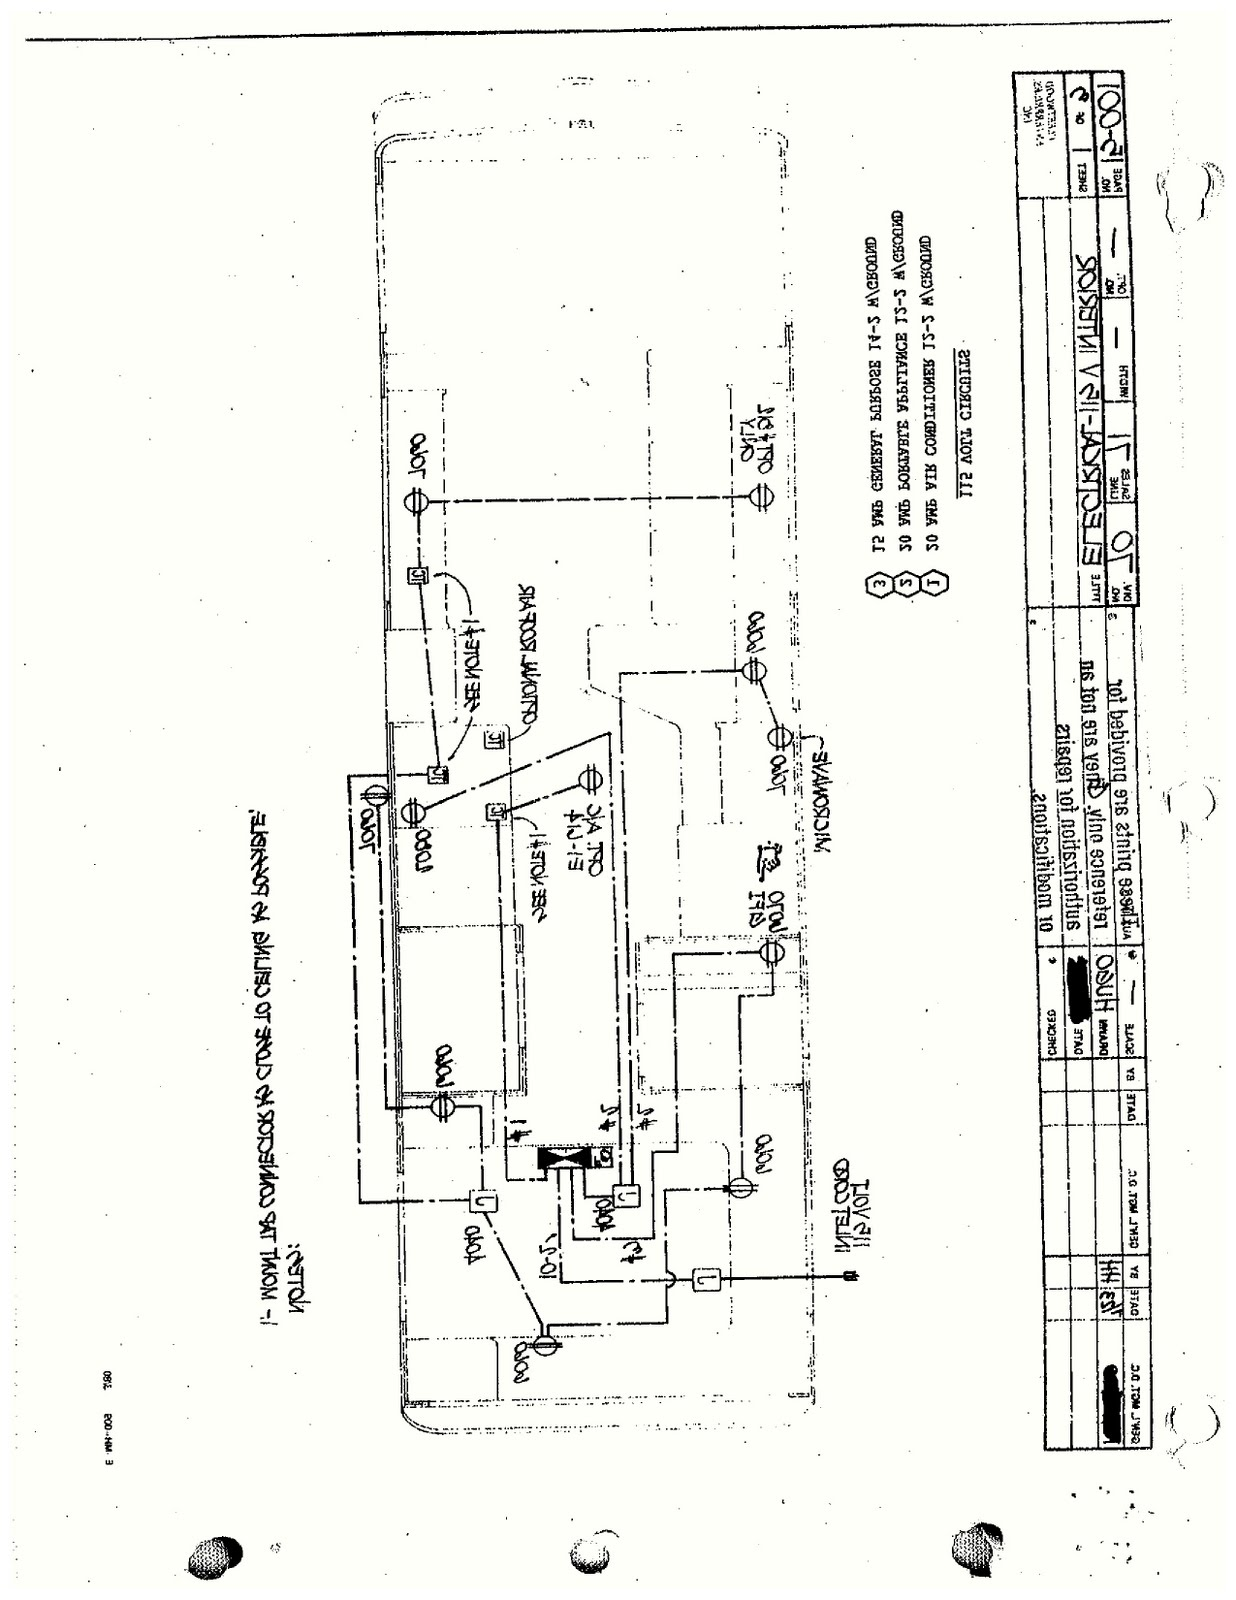 small resolution of 1987 coleman pop up camper wiring diagram somurich com fleetwood travel trailer wiring fleetwood